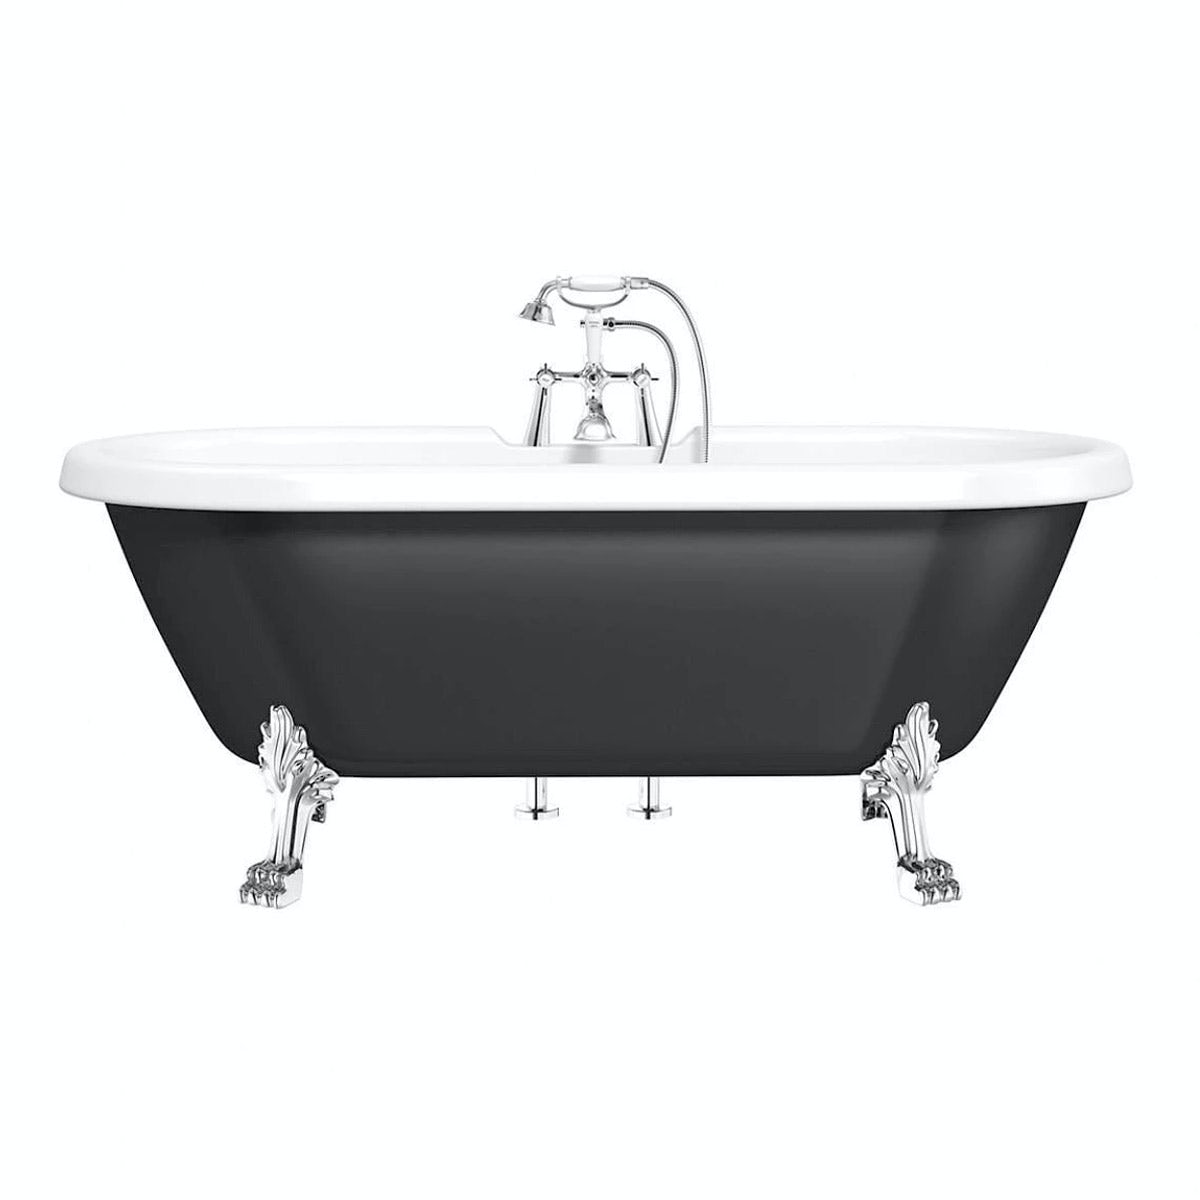 The Bath Co. Dulwich traditional roll top bath with dragon feet black